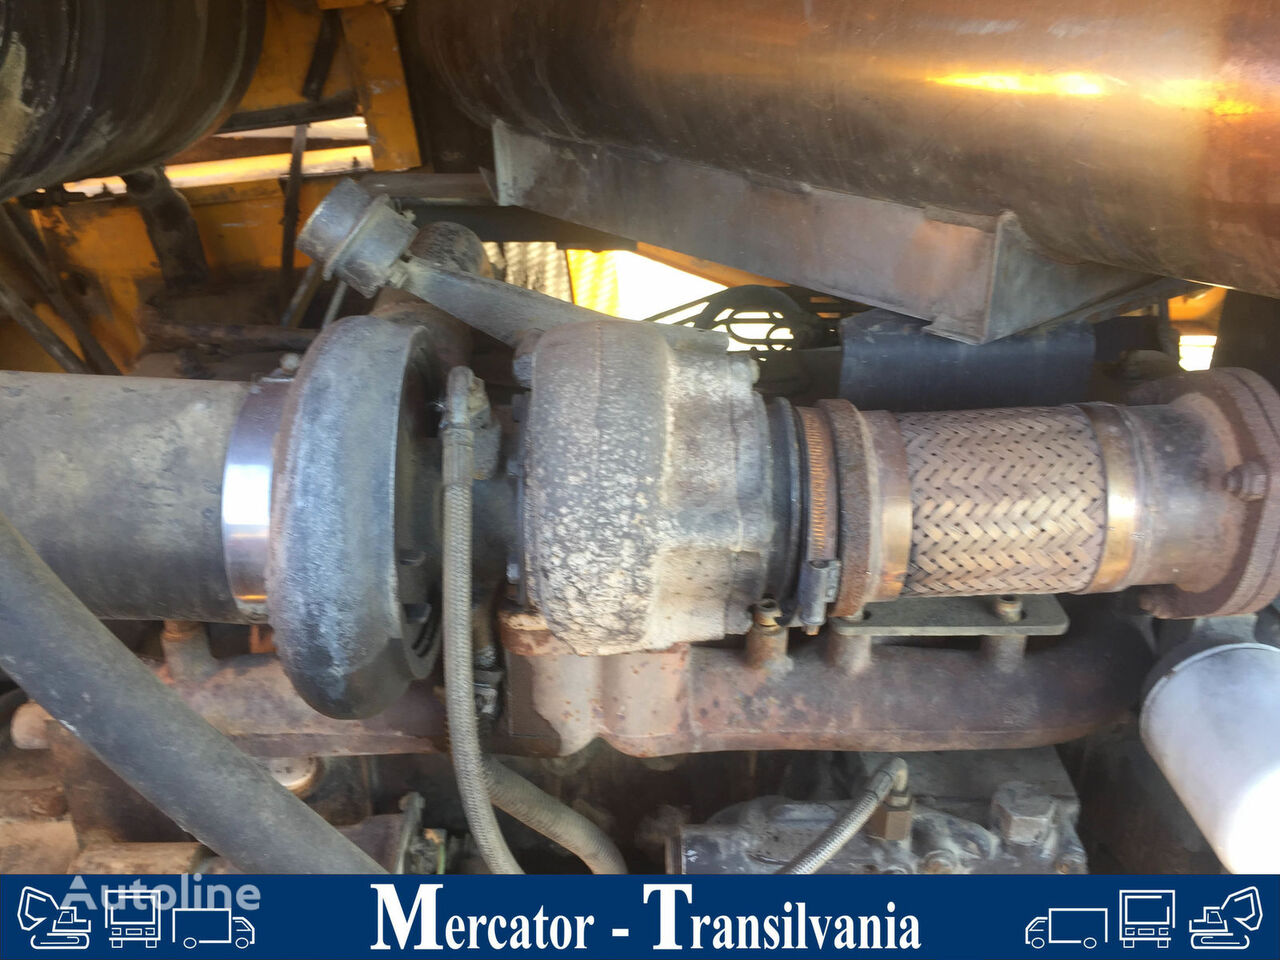 Turboluftgebläse engine turbocharger for JCB 456 wheel loader